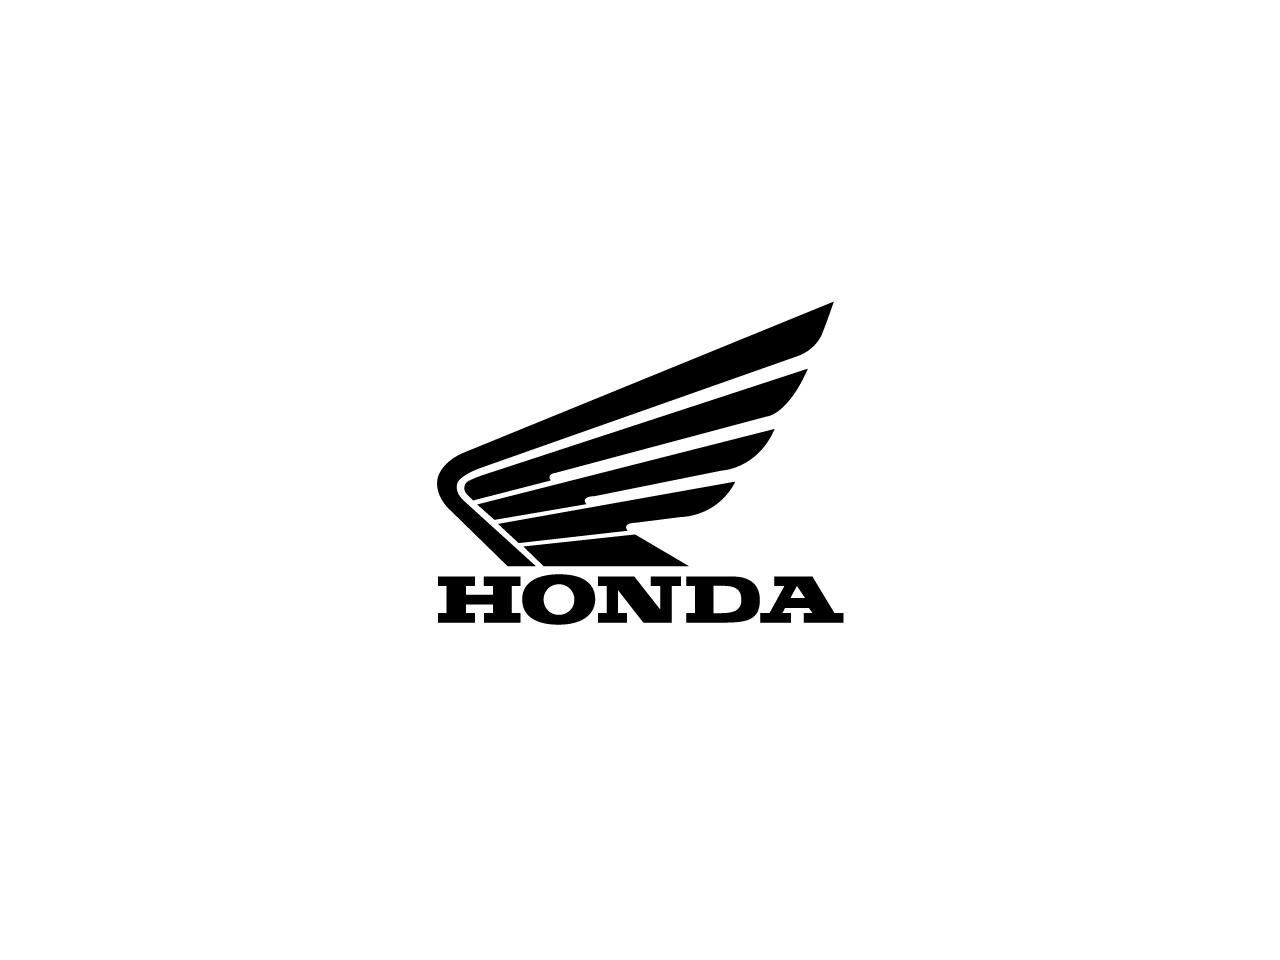 Free Honda Logo Cliparts, Download Free Clip Art, Free